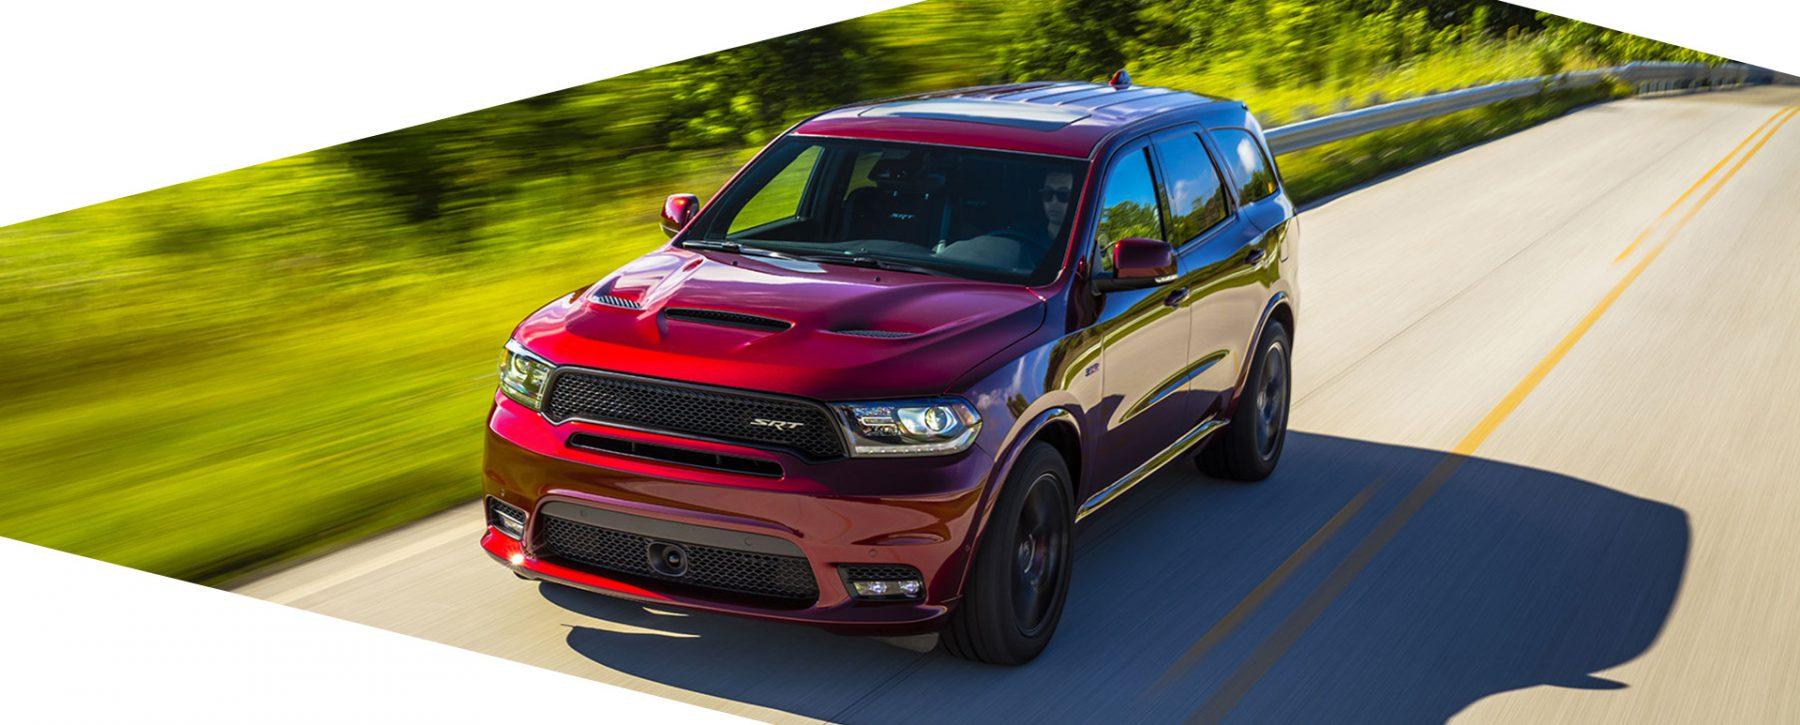 Red Dodge Durango SRT